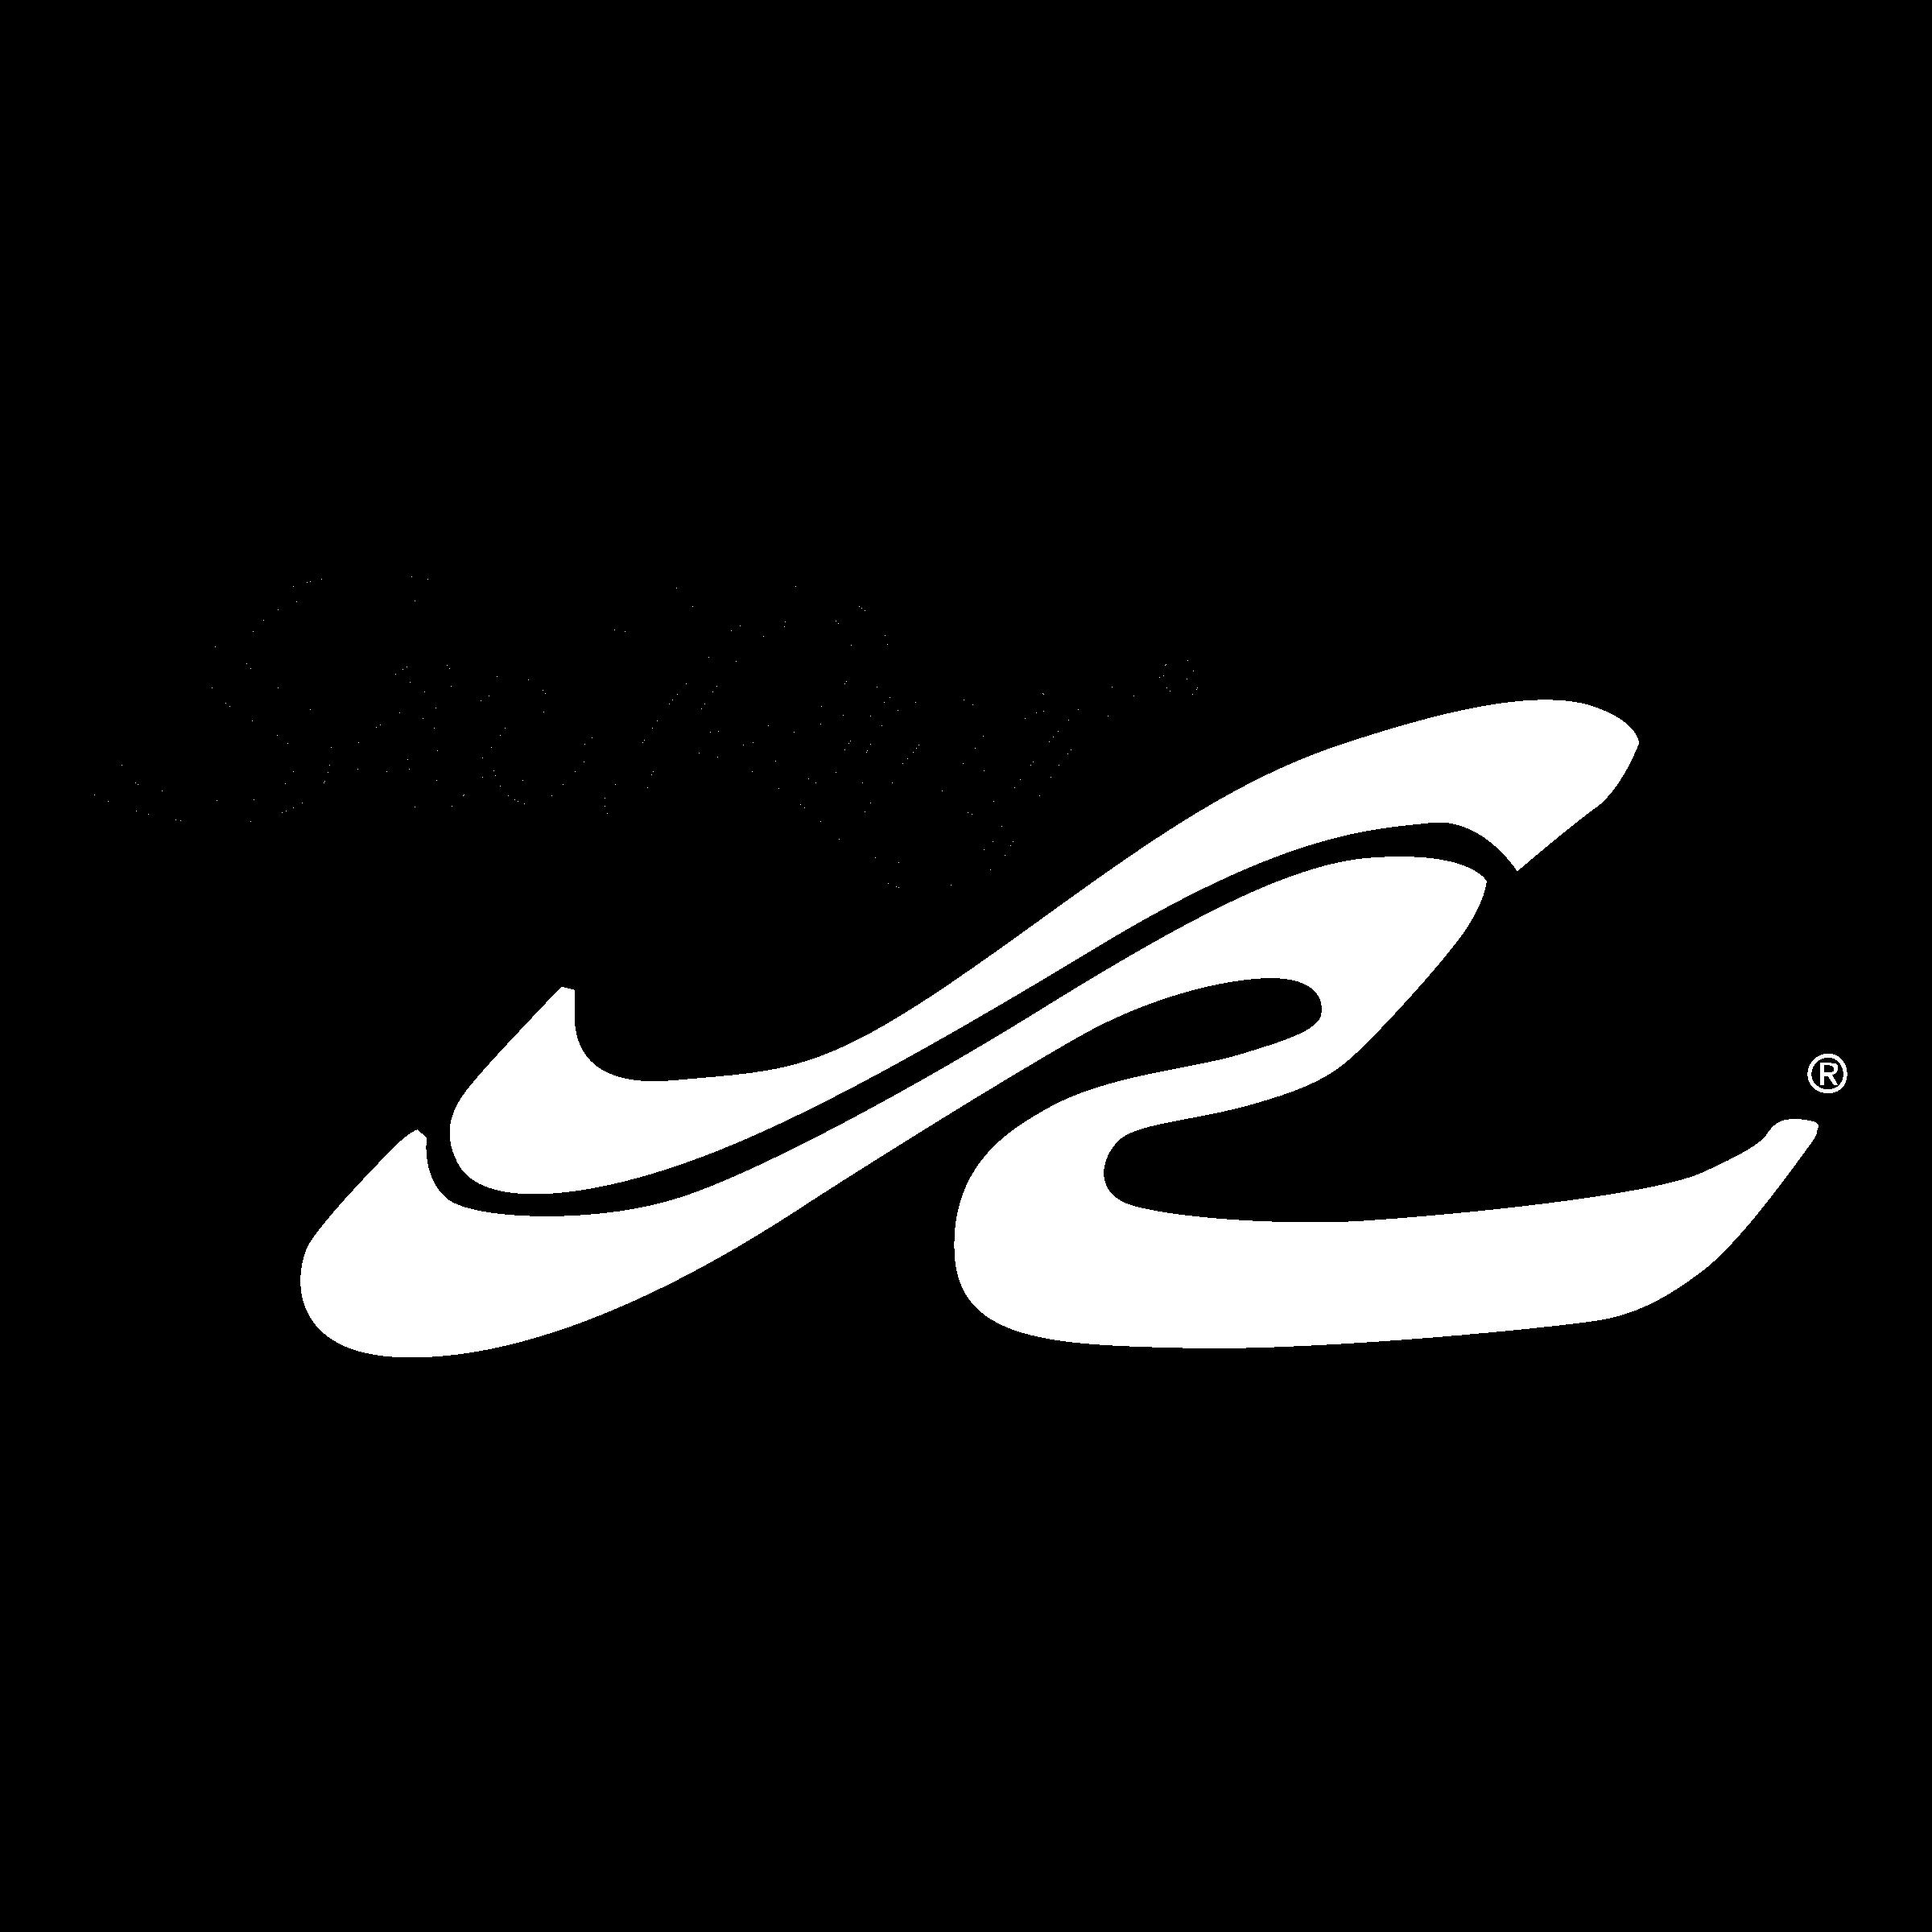 Sea Ray Logo PNG Transparent & SVG Vector.